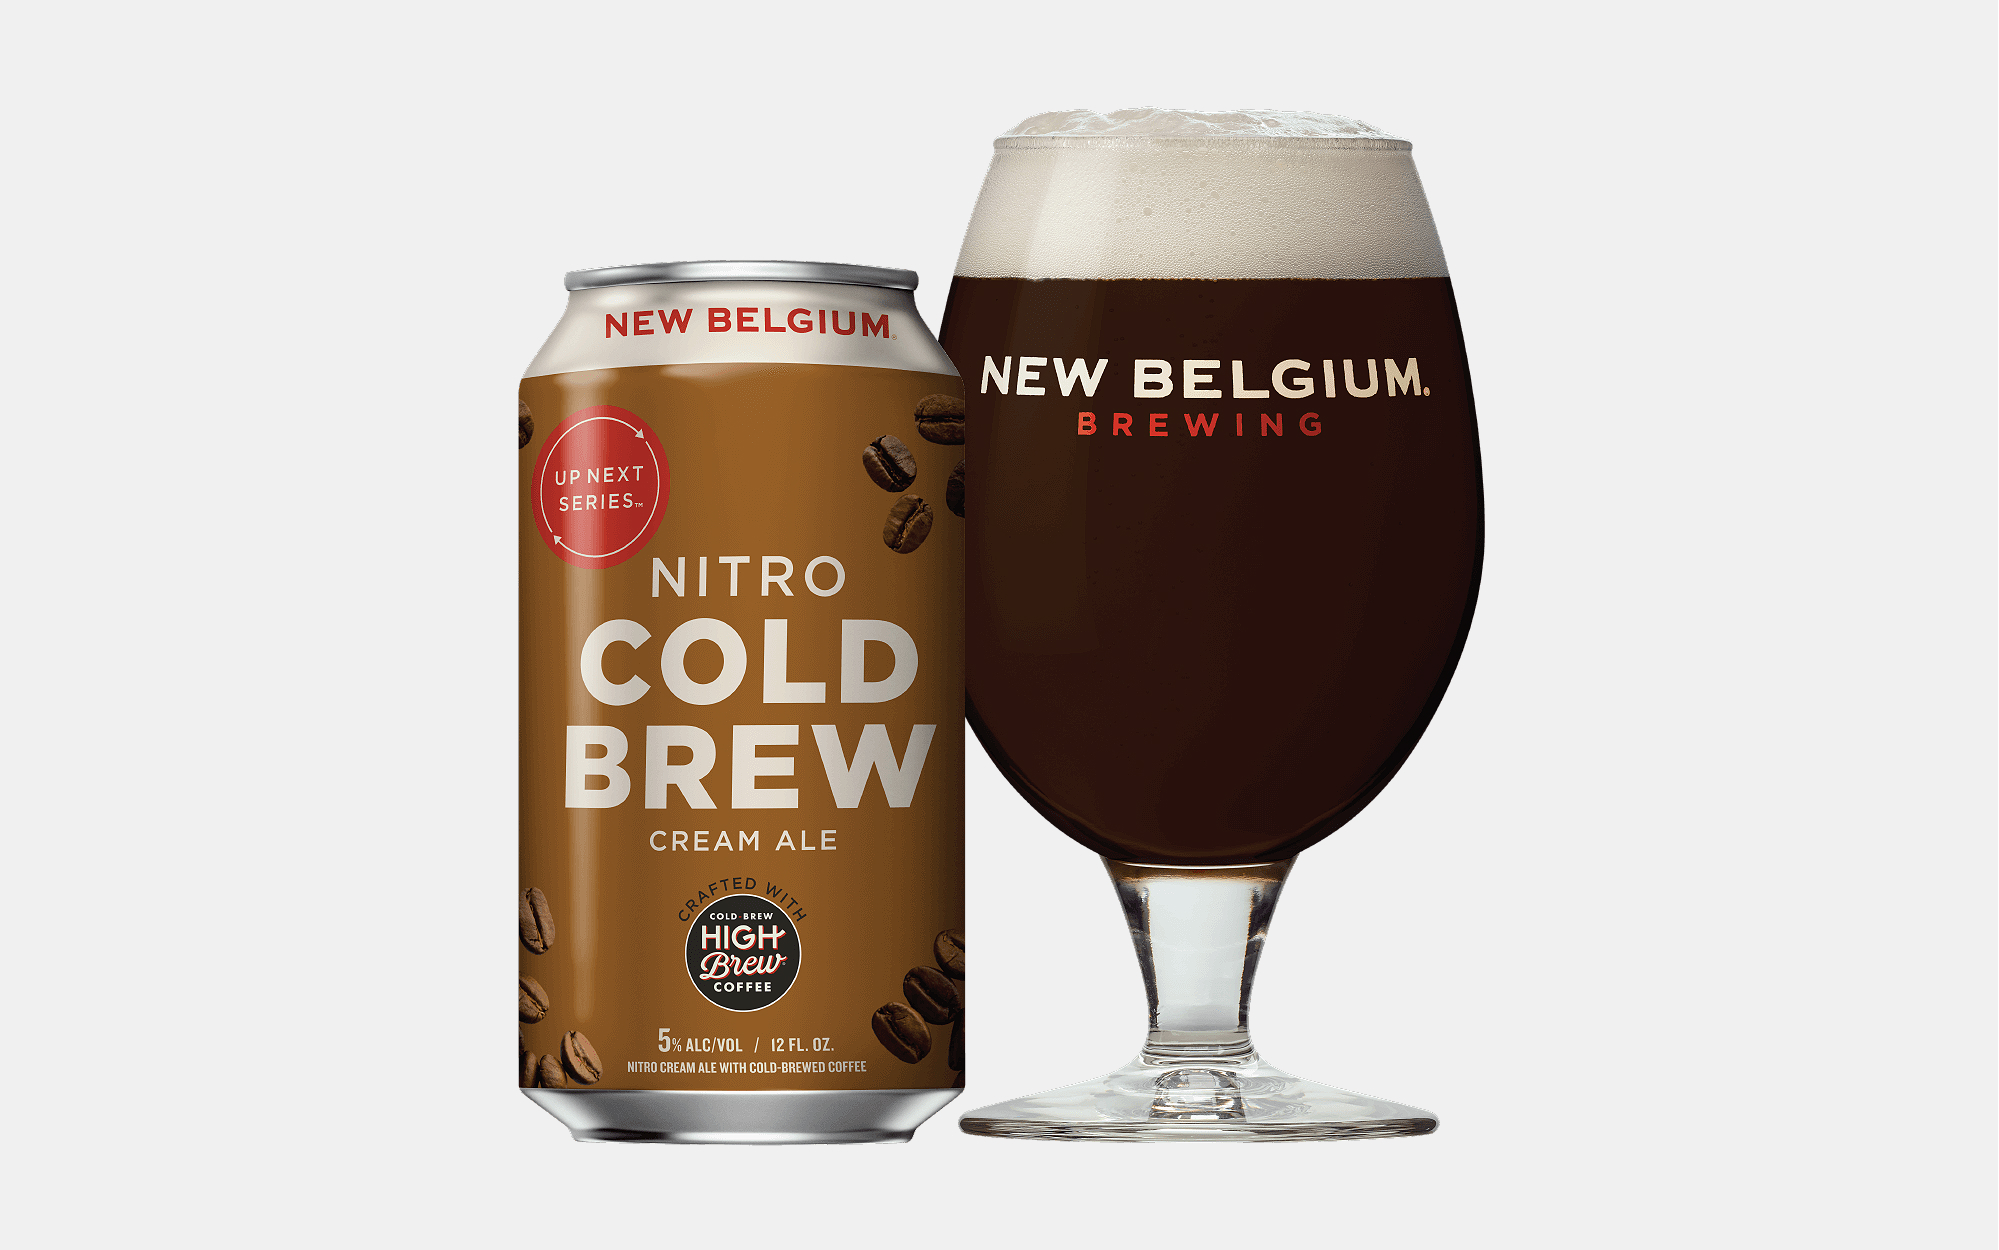 New Belgium Nitro Cold Brew Cream Ale